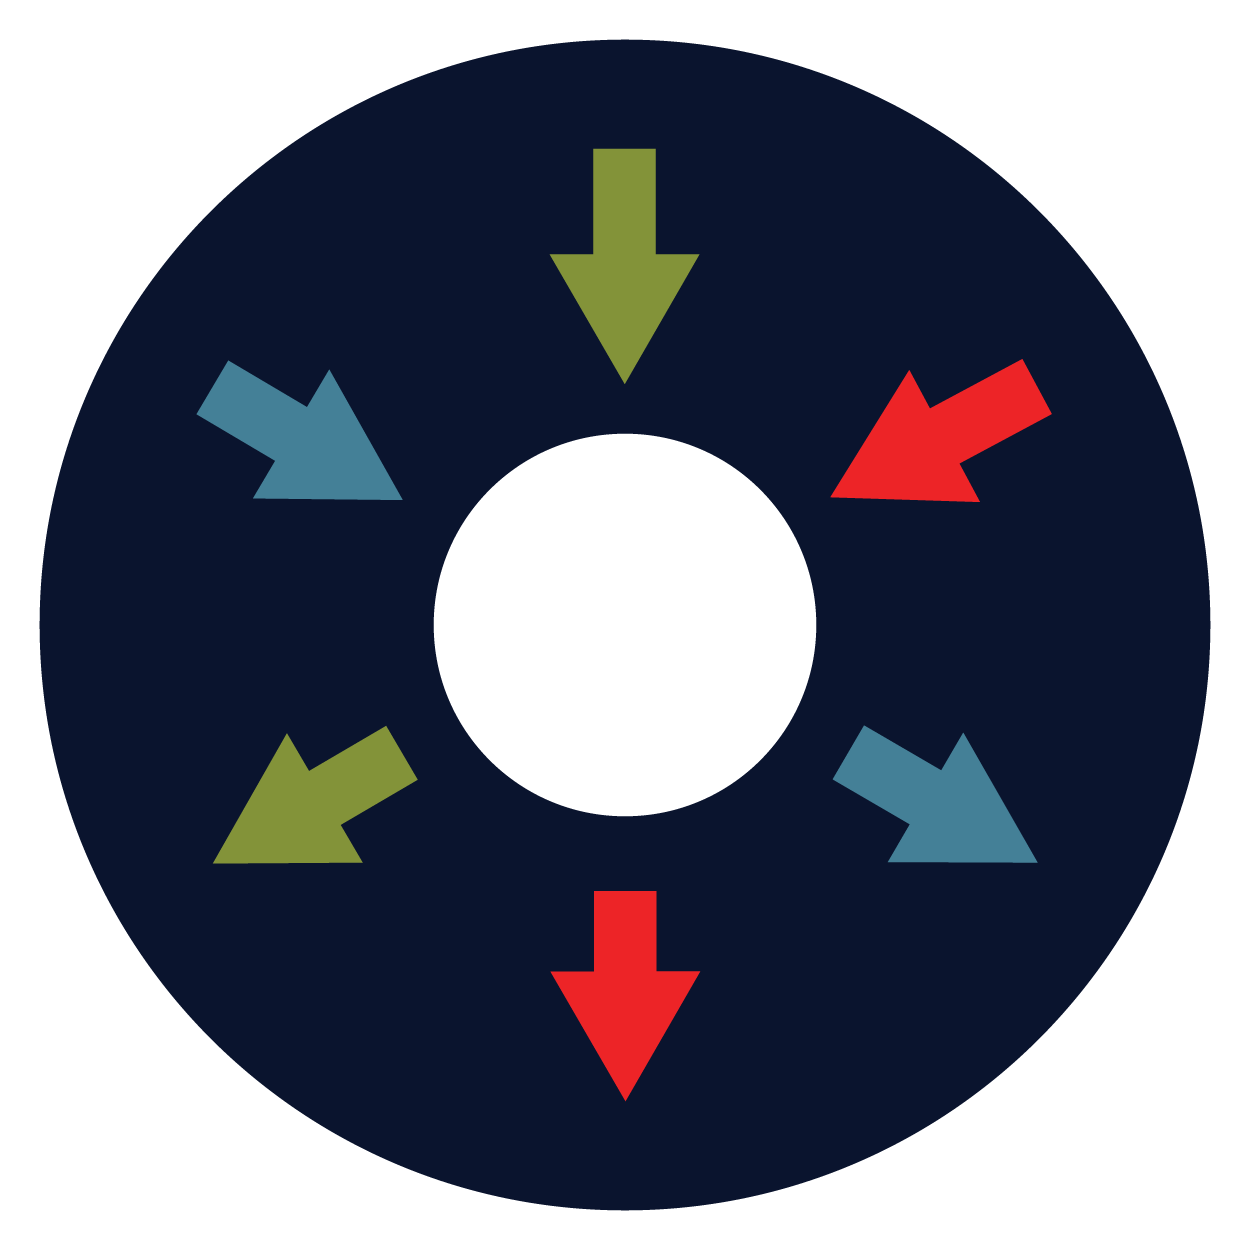 csch goal icons 4